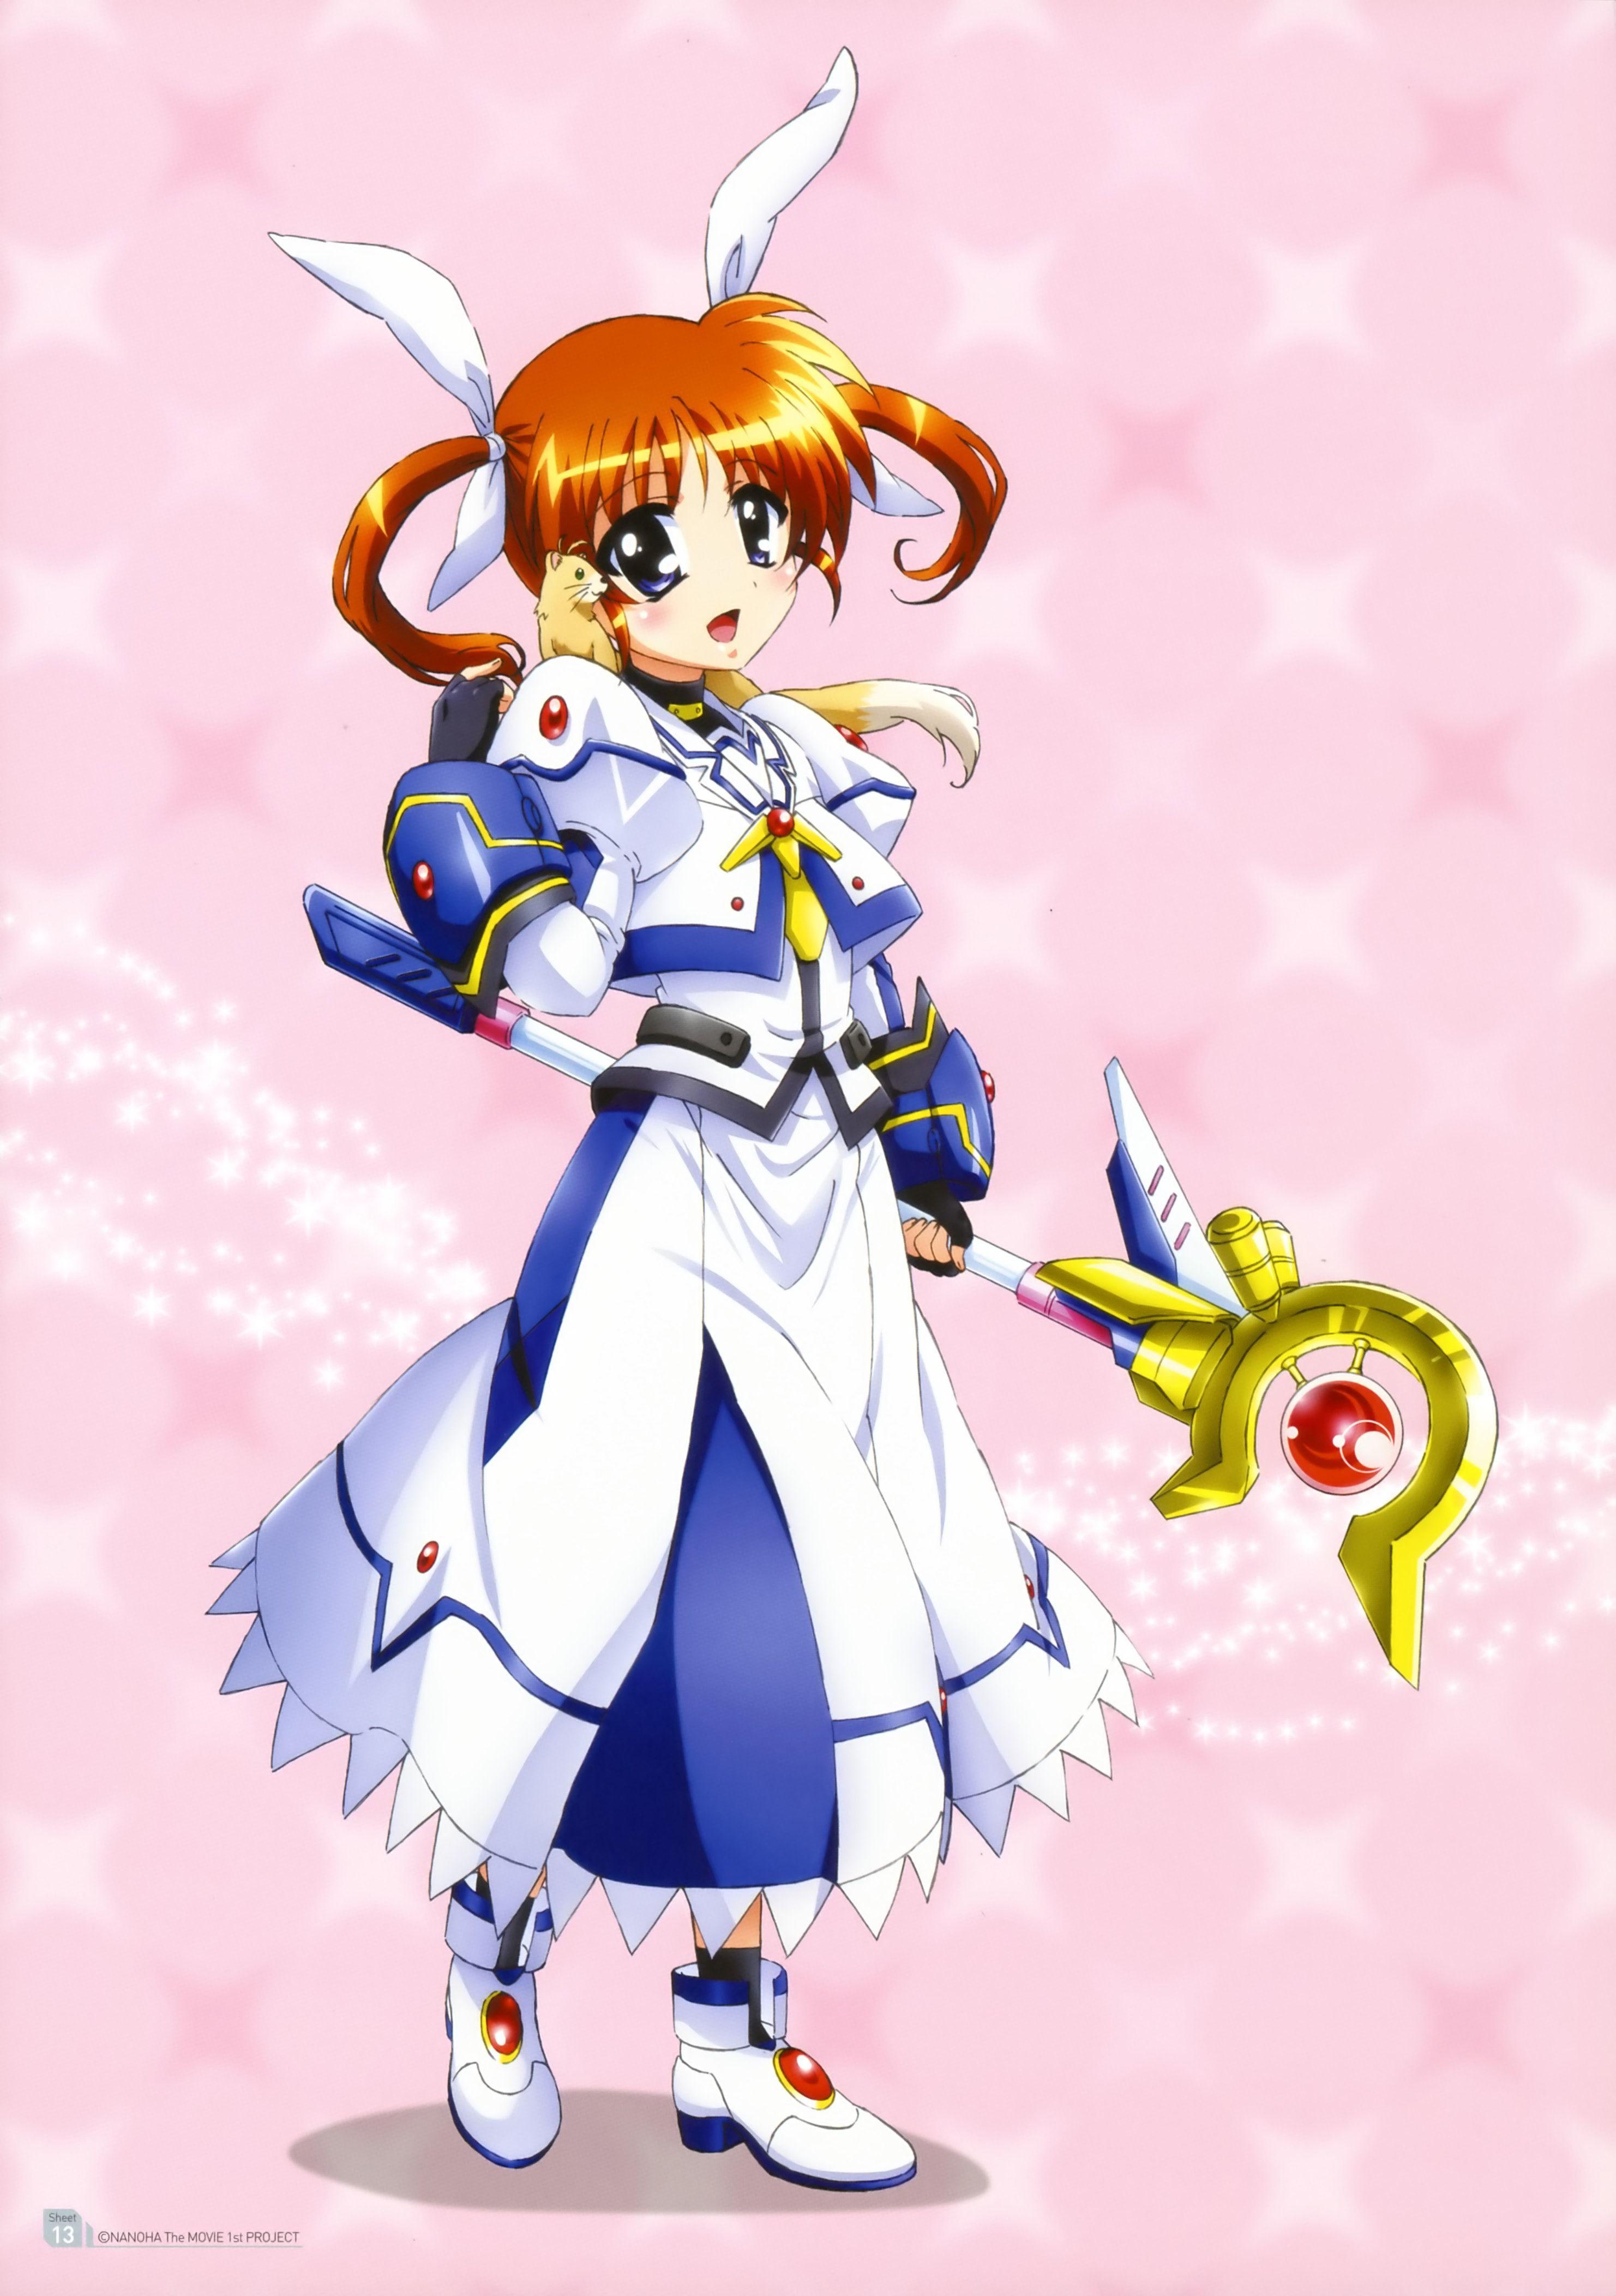 nanoha takamachi Google Search 魔法少女, 魔法少女リリカルなのは, リリカル